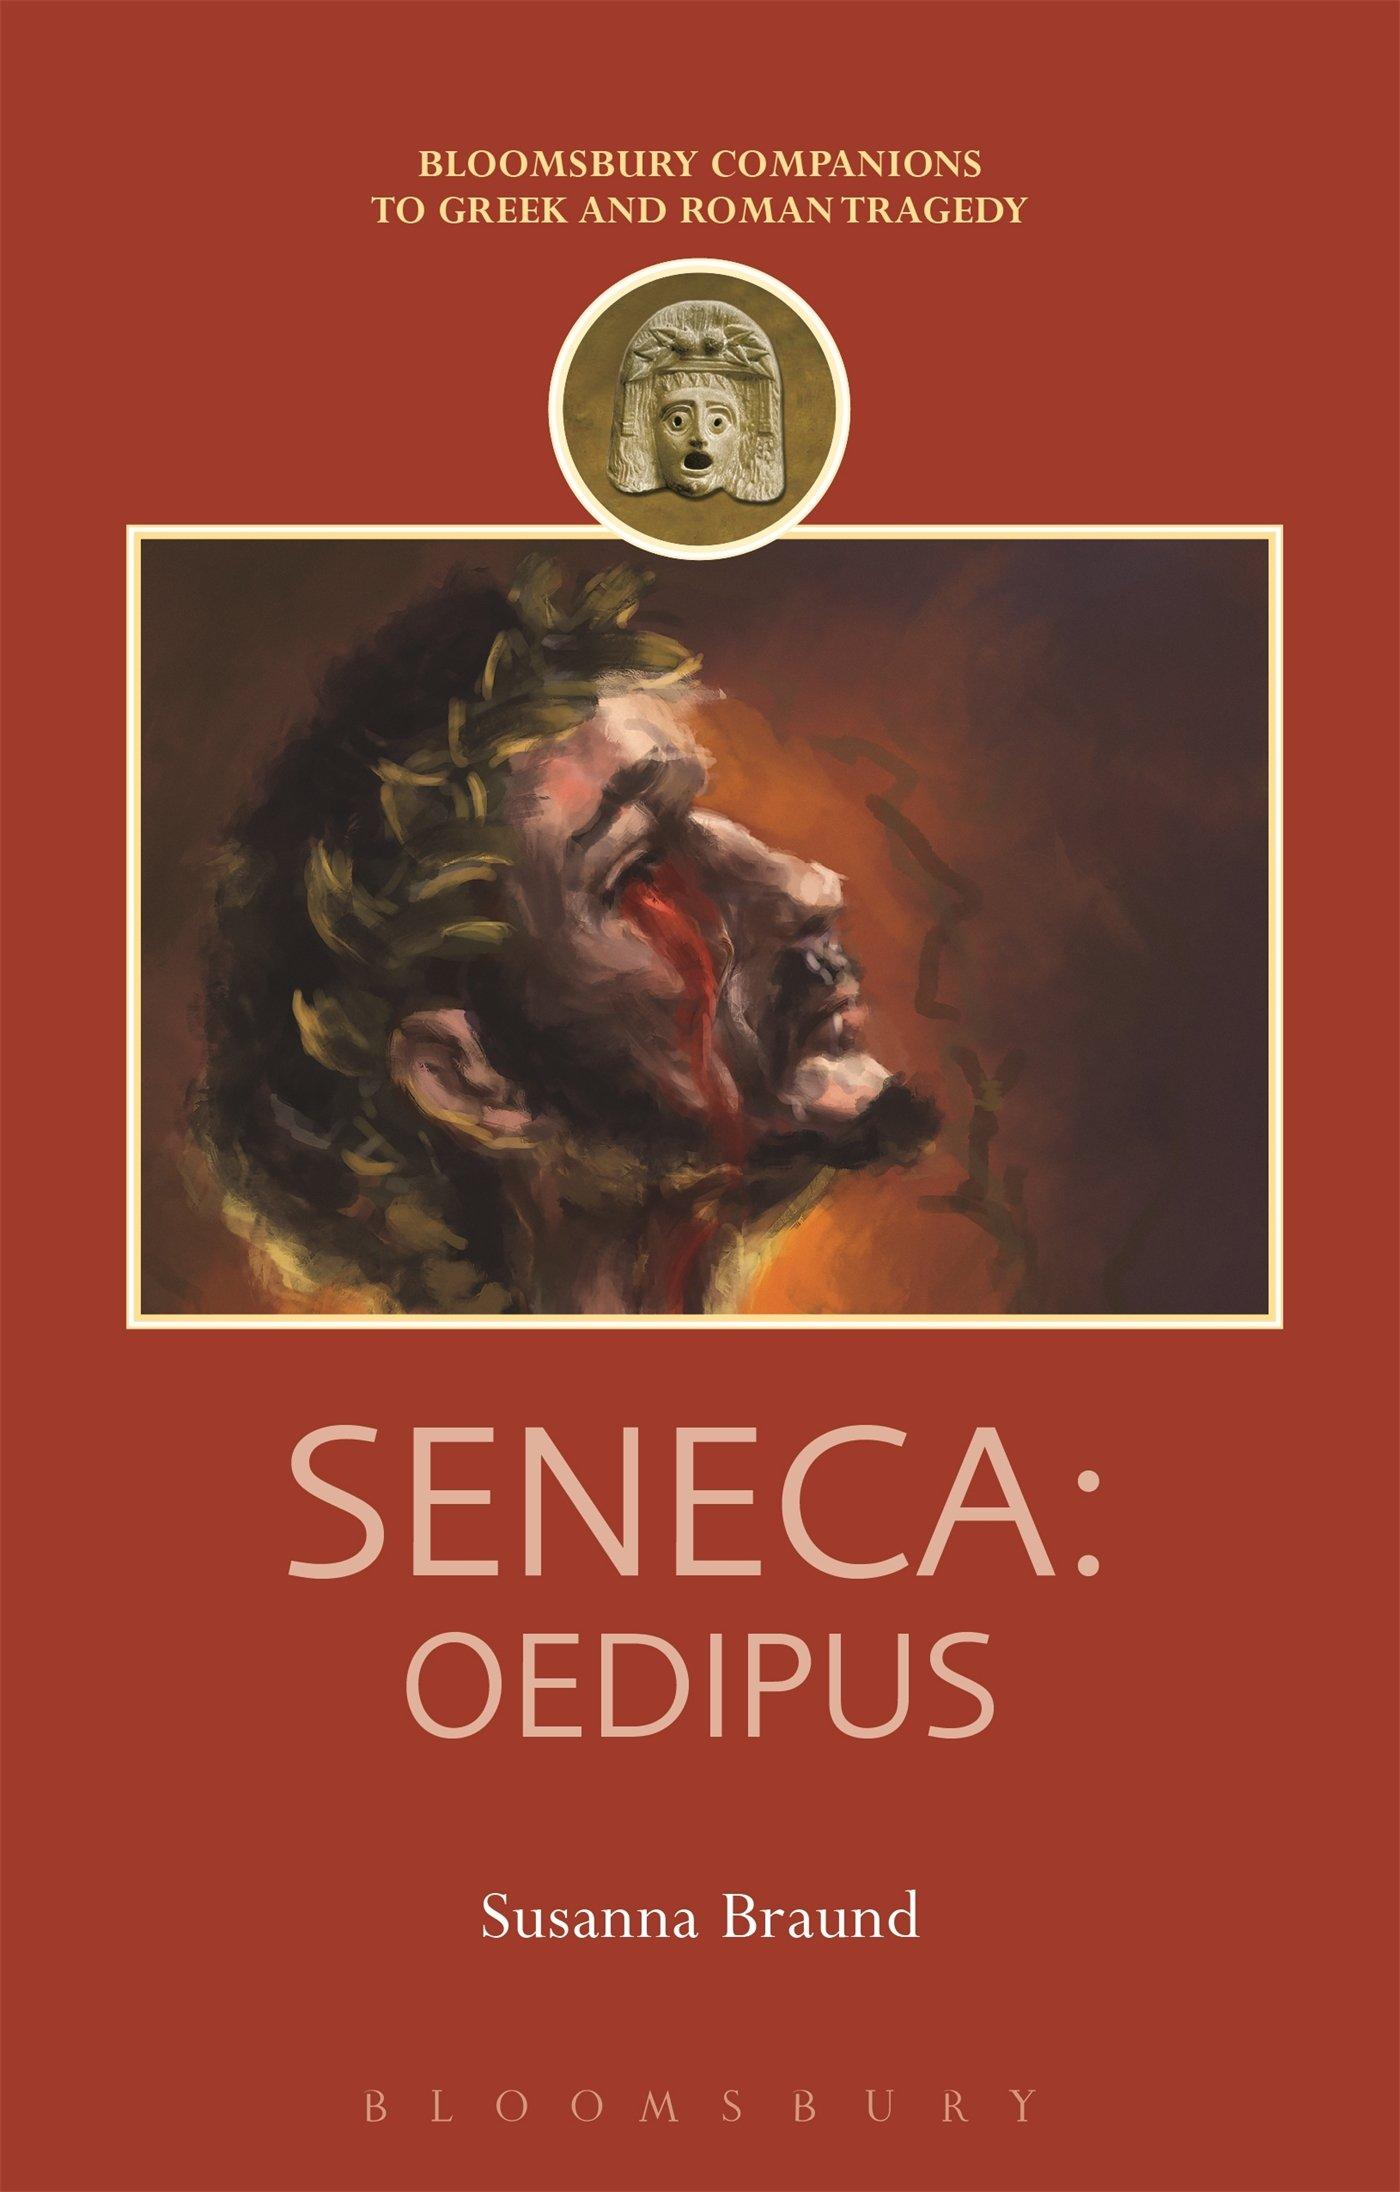 Seneca: Oedipus Companions to Greek and Roman Tragedy: Amazon ...